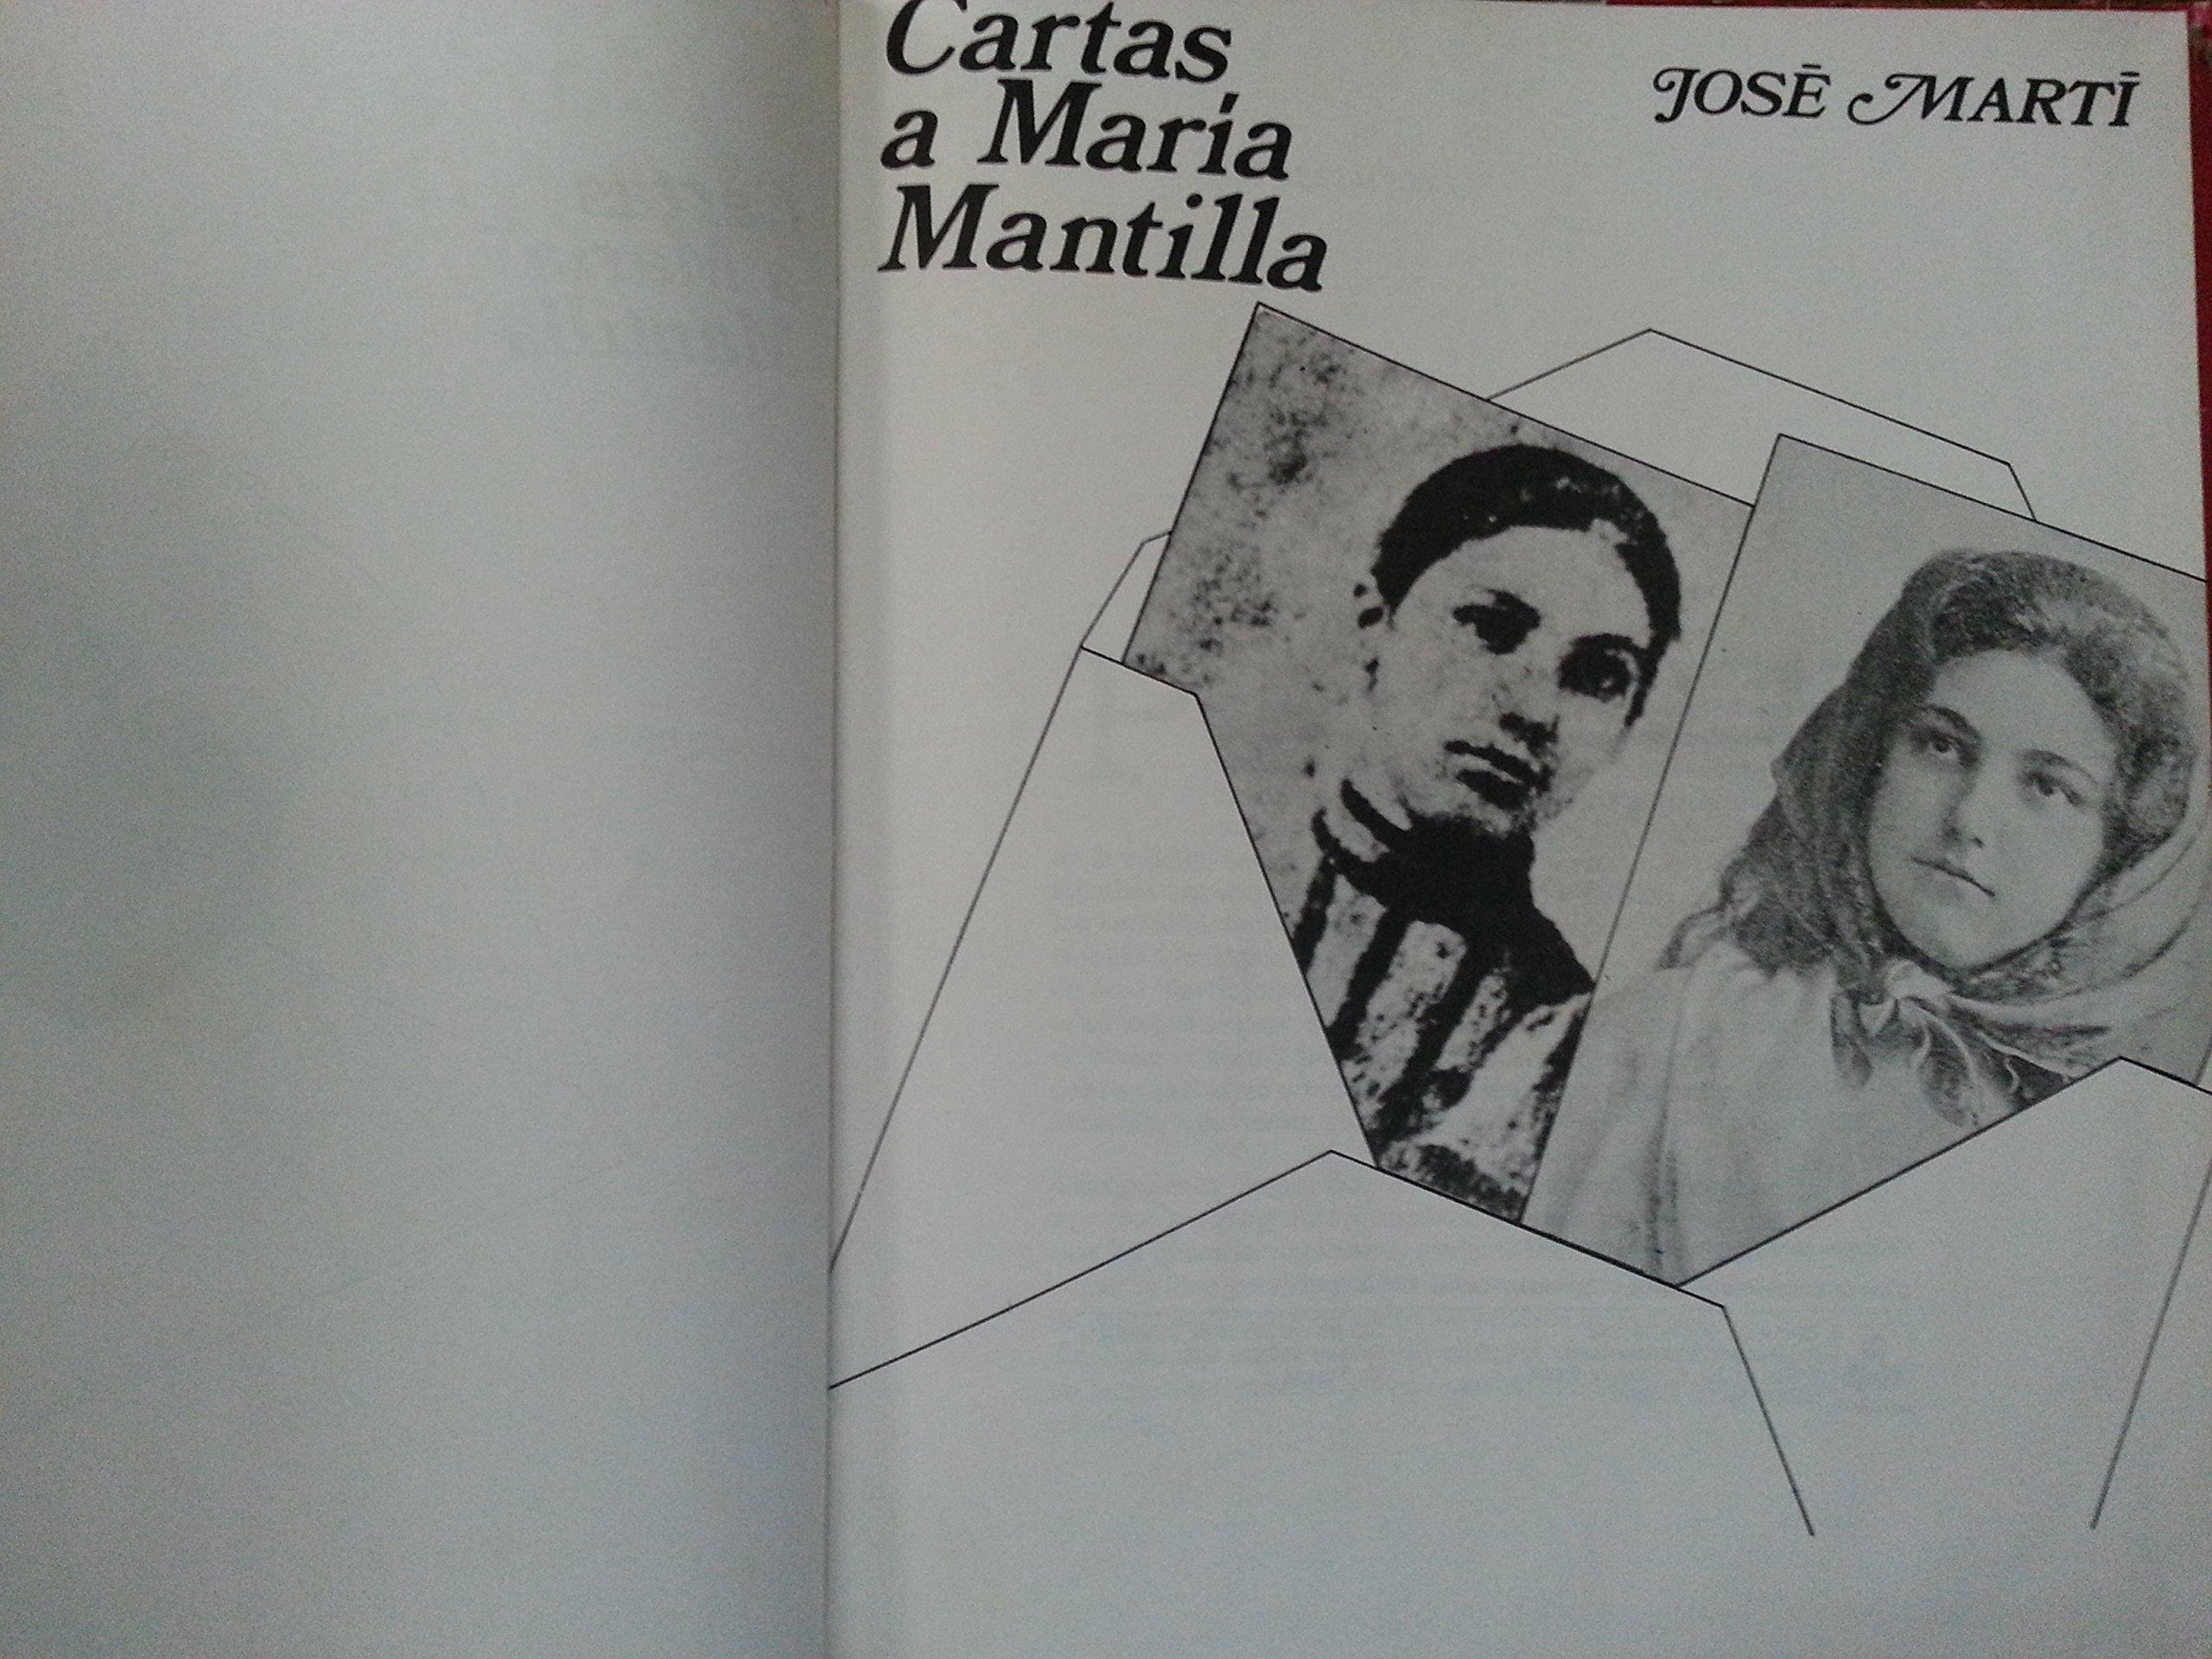 Jose marti, cartas a maria mantilla, habana, cuba, 1982.: jose marti: Amazon.com: Books